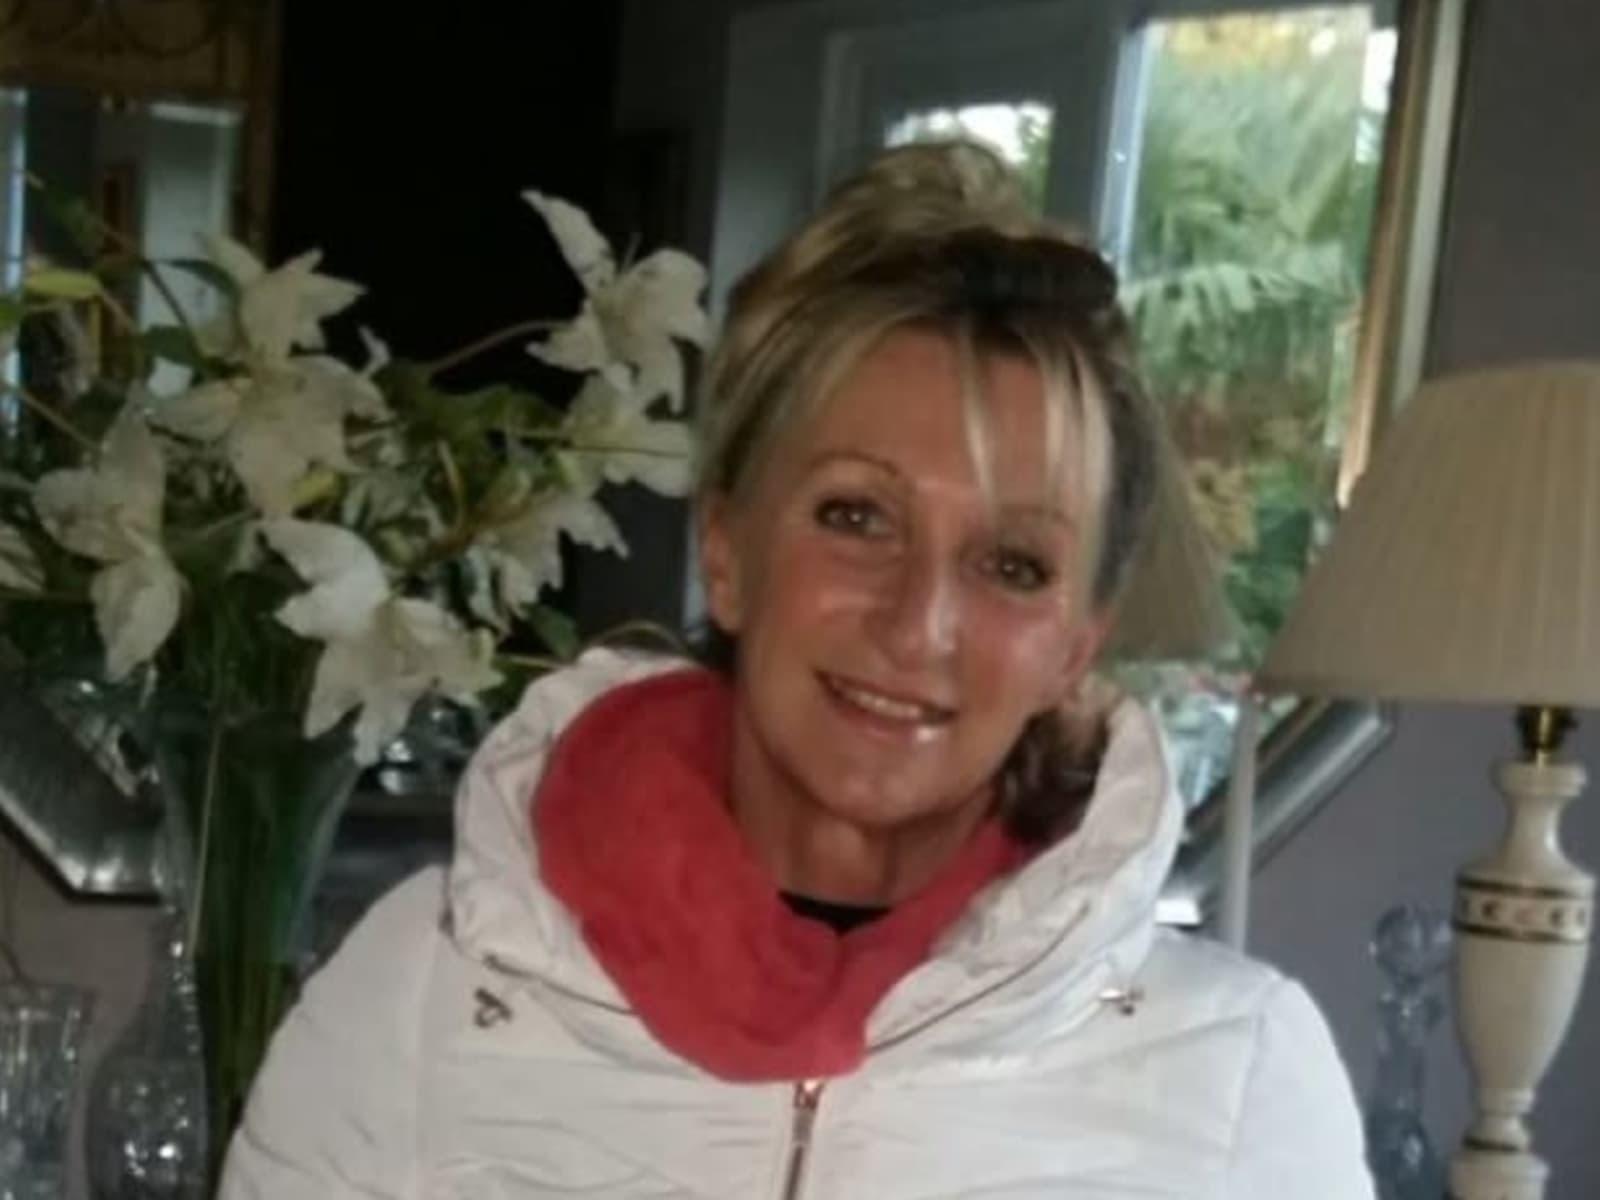 Julie from Royal Tunbridge Wells, United Kingdom